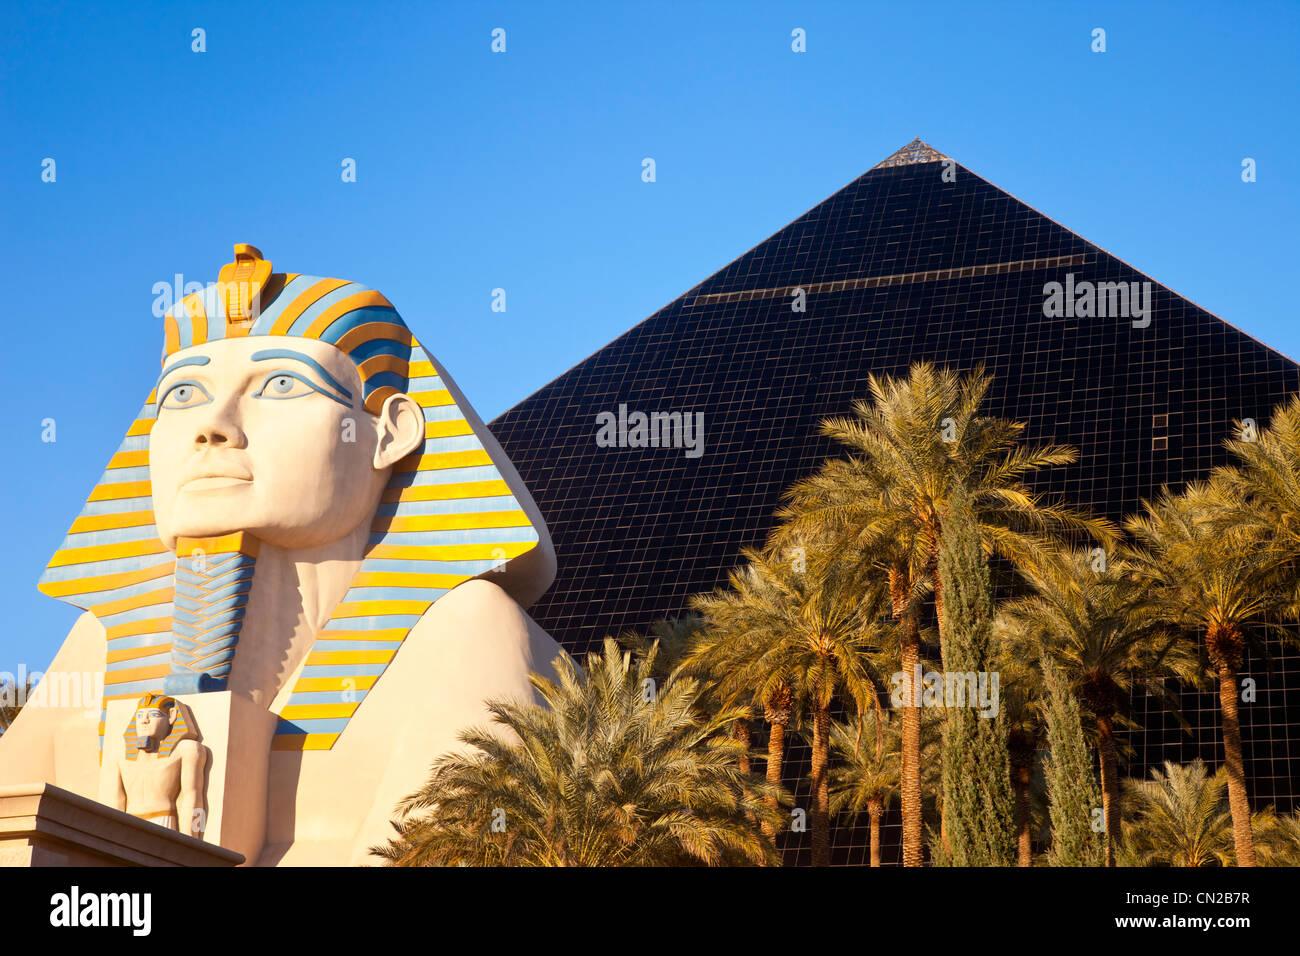 Sphinx And Pyramid The Luxor Hotel Las Vegas Nevada Usa Stock